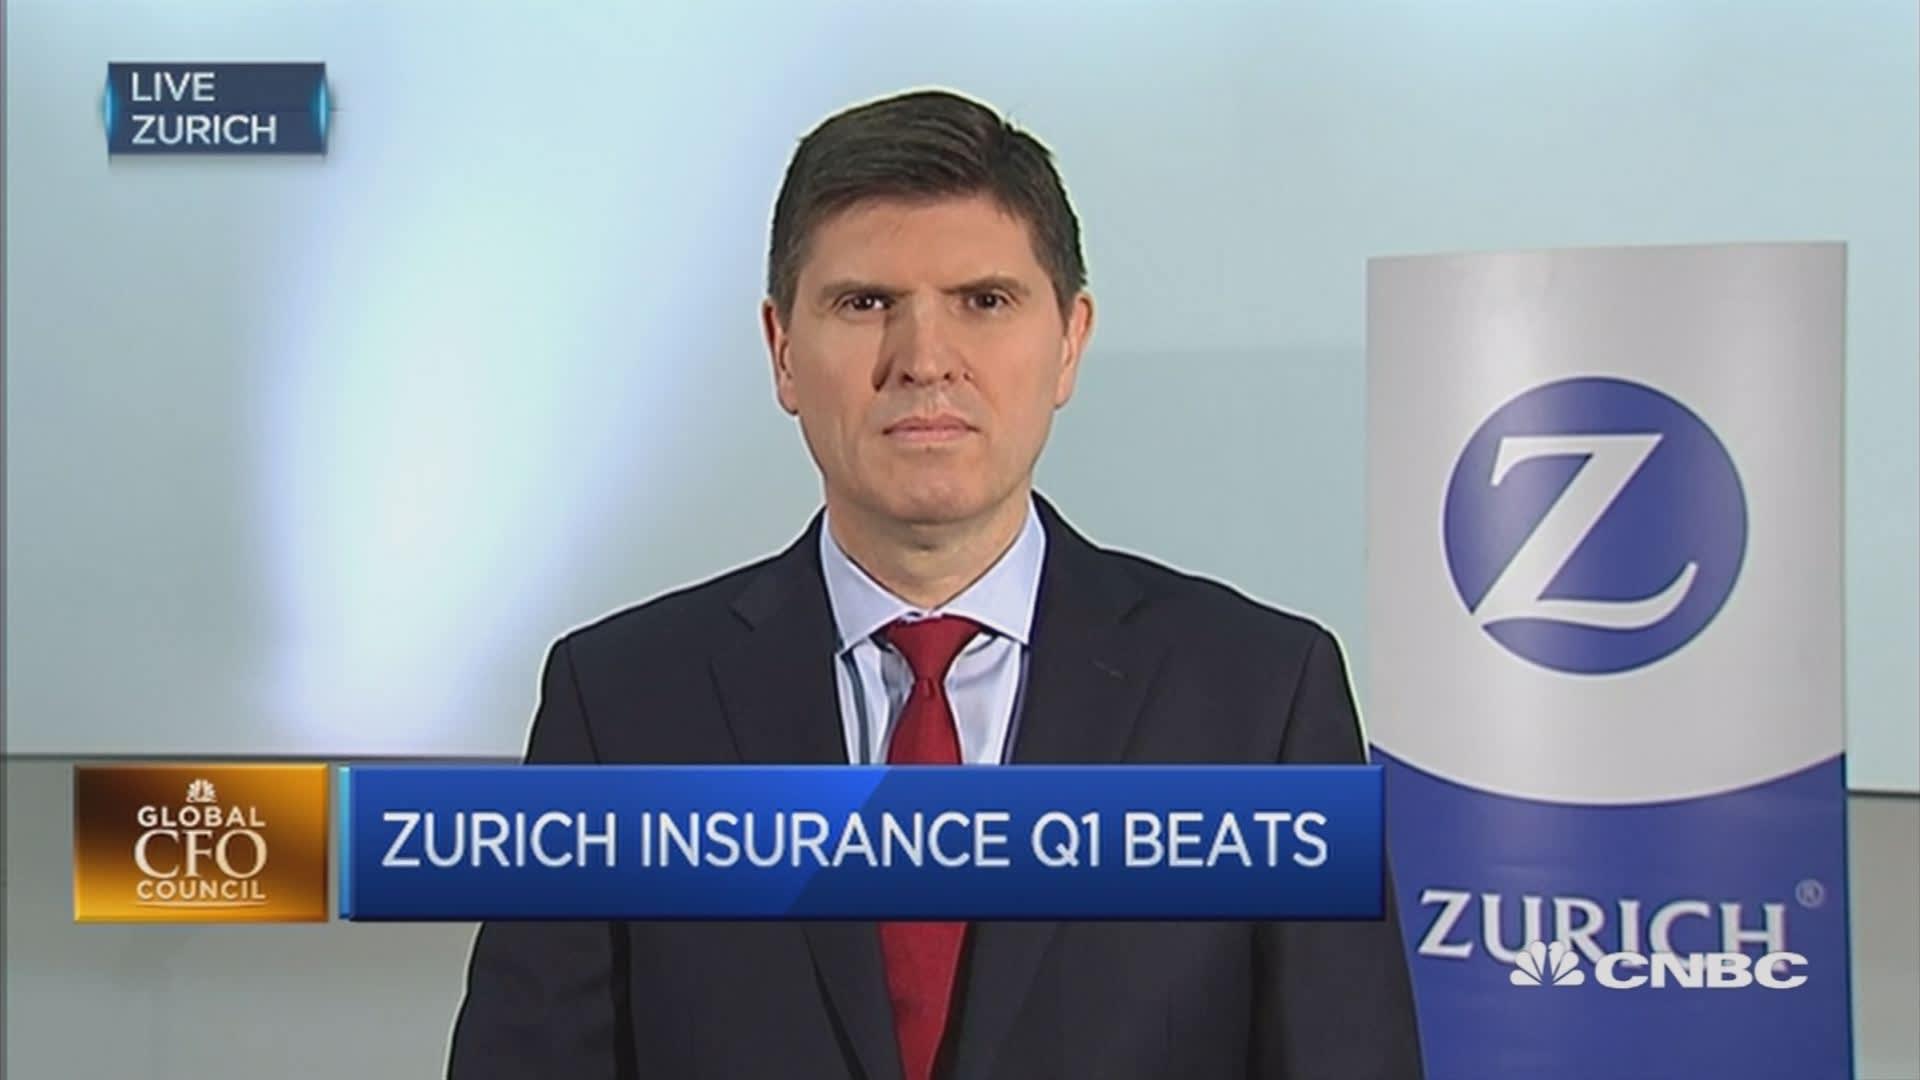 Zurich Insurance Posts 875 Million Q1 Net Profit Beats Poll